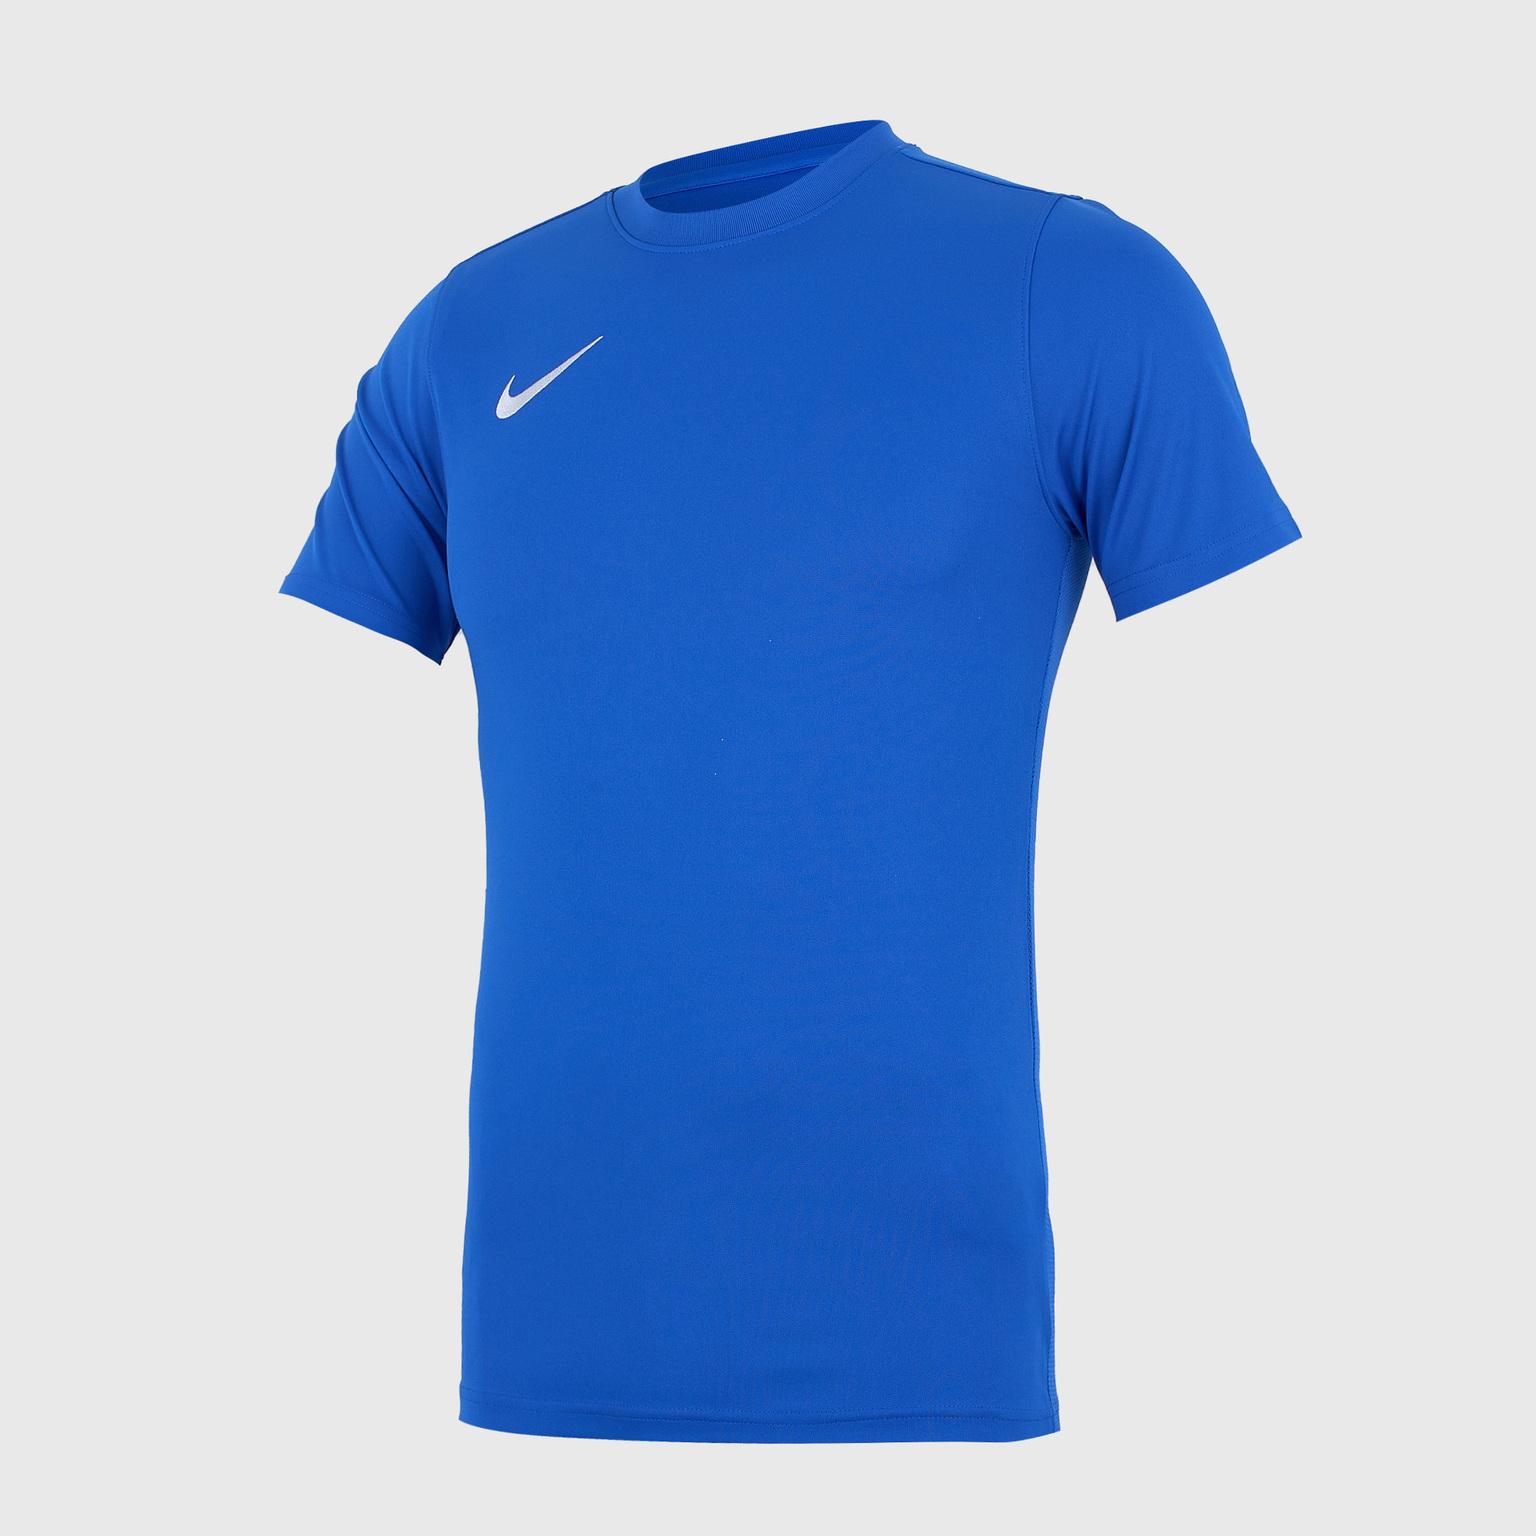 Футболка игровая Nike Dry Park VII BV6708-463 цена и фото